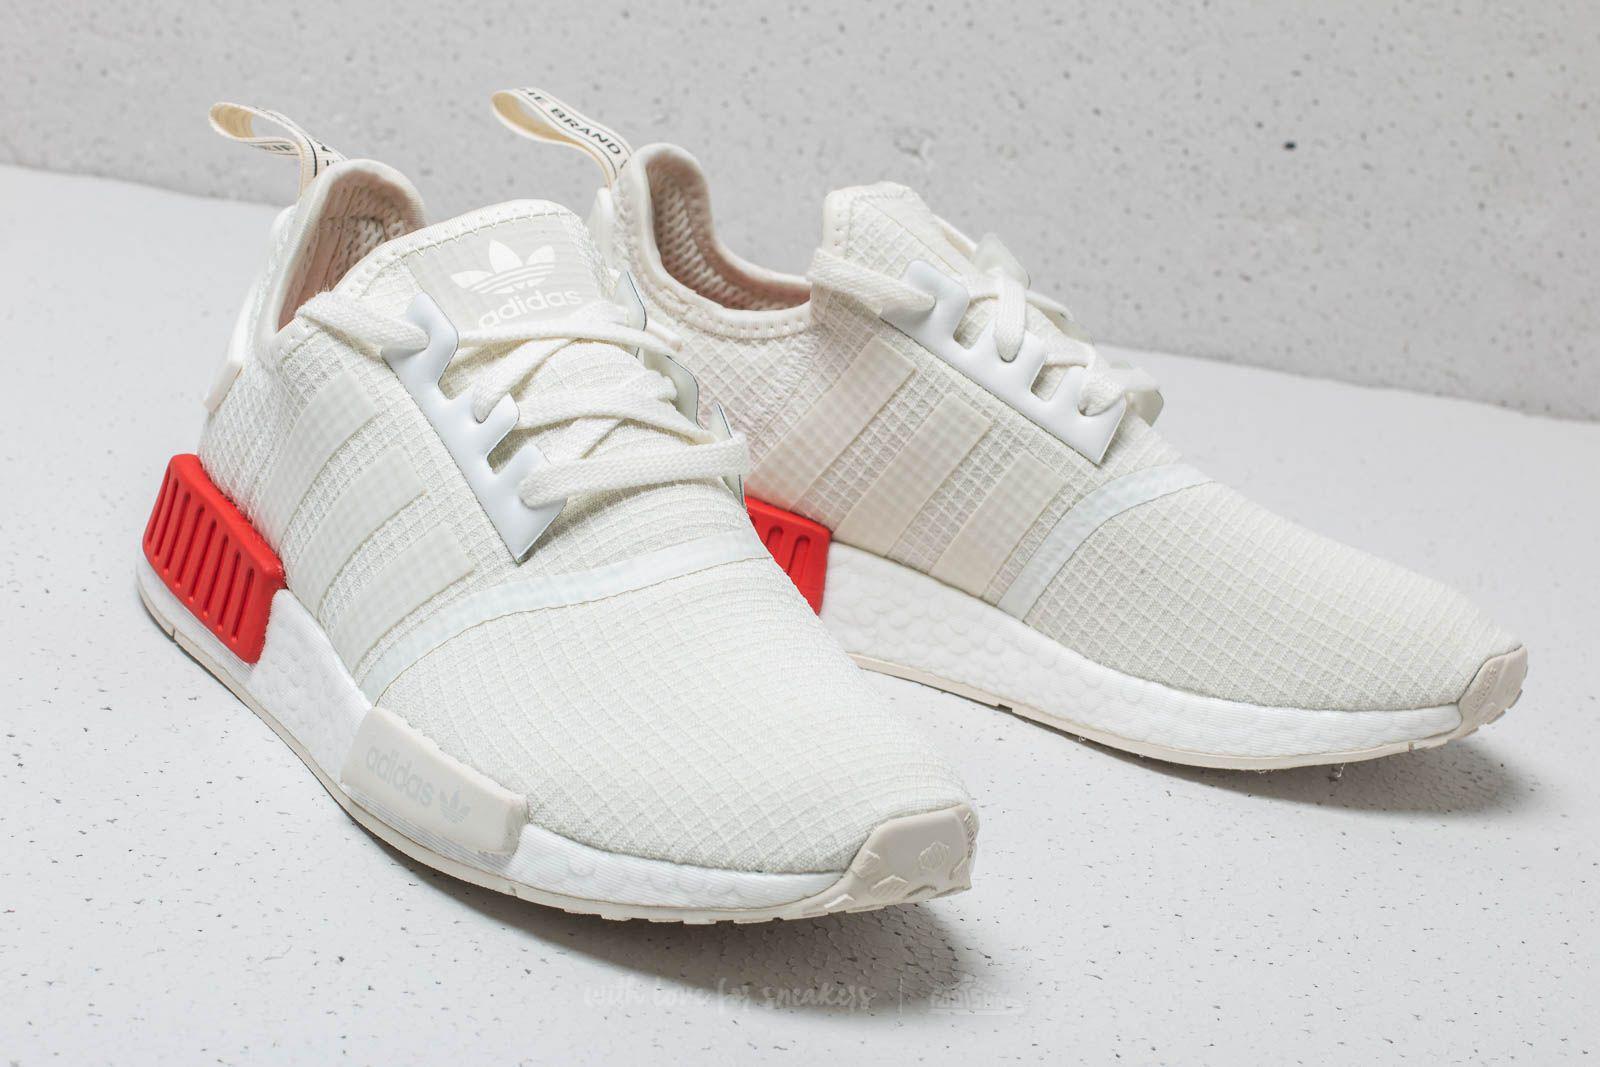 9c150b1530c26 Lyst - adidas Originals Adidas Nmd r1 Off White  Off White  Lush Red ...